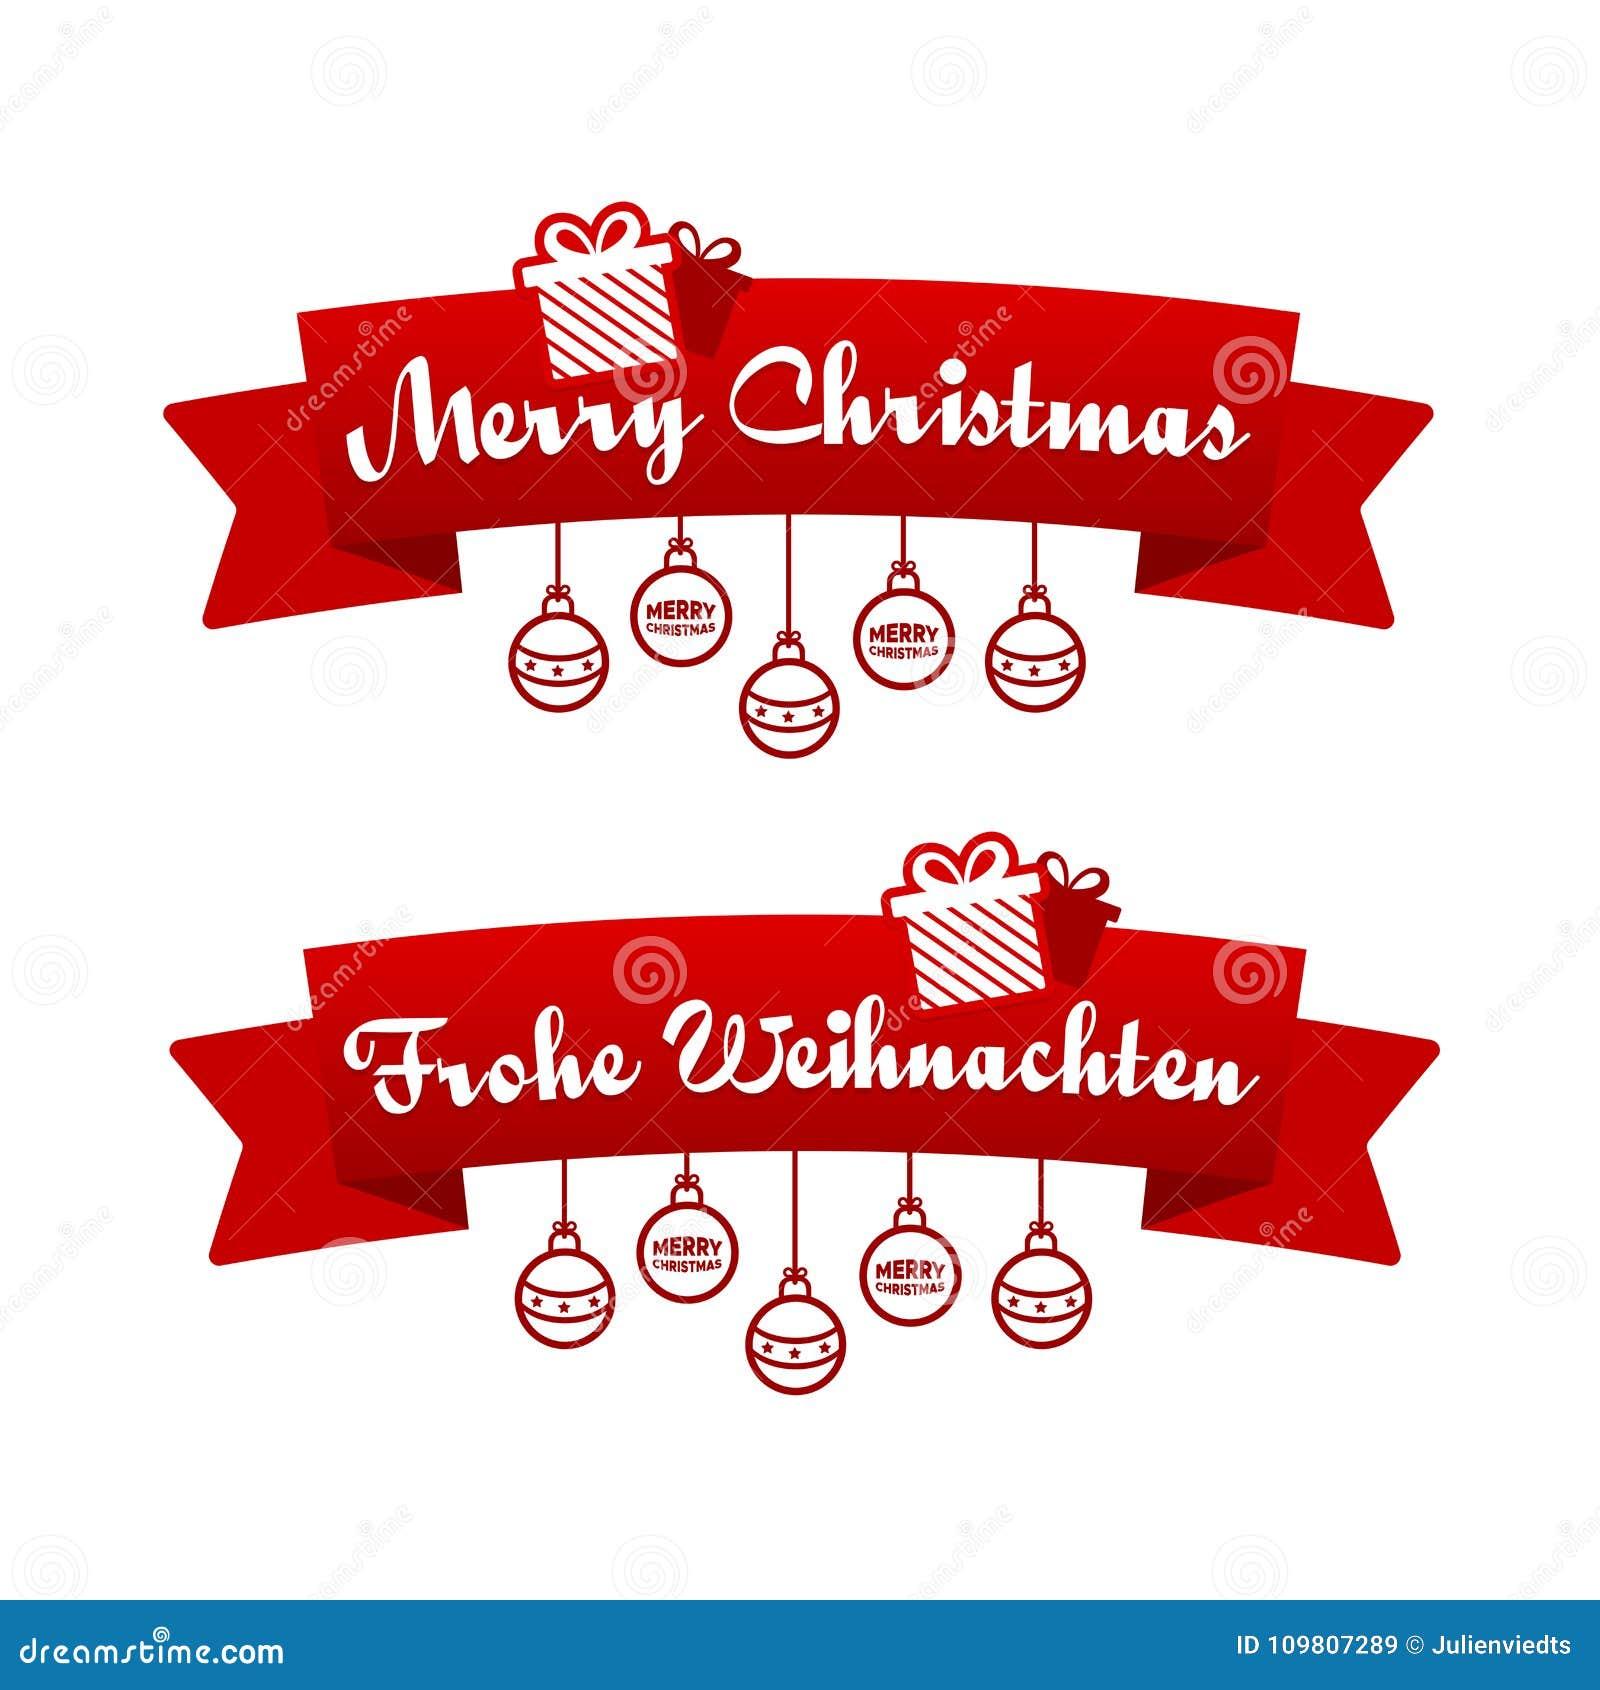 Merry Christmas Ribbon Clipart.Merry Christmas Ribbons Eps10 Vector Stock Vector